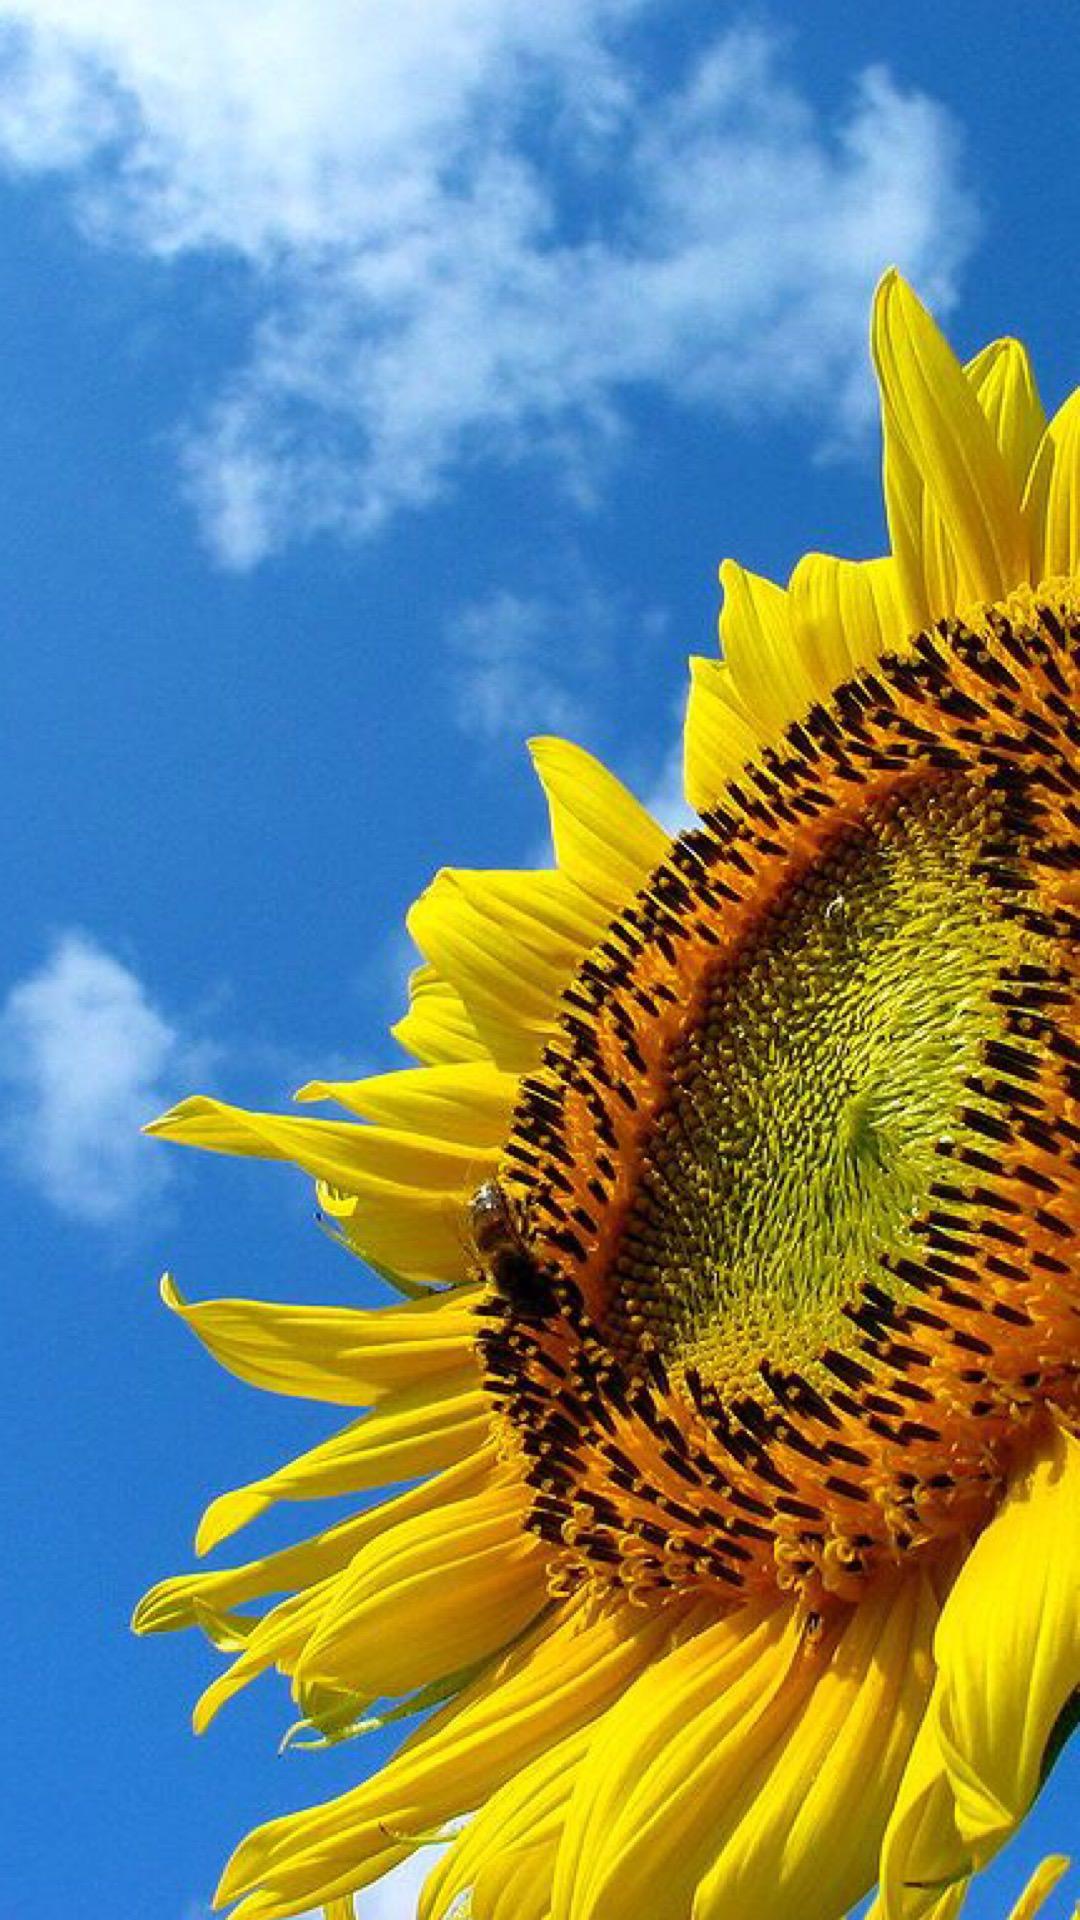 Sunflower Sky wallpapersc iPhone7Plus 1080x1920